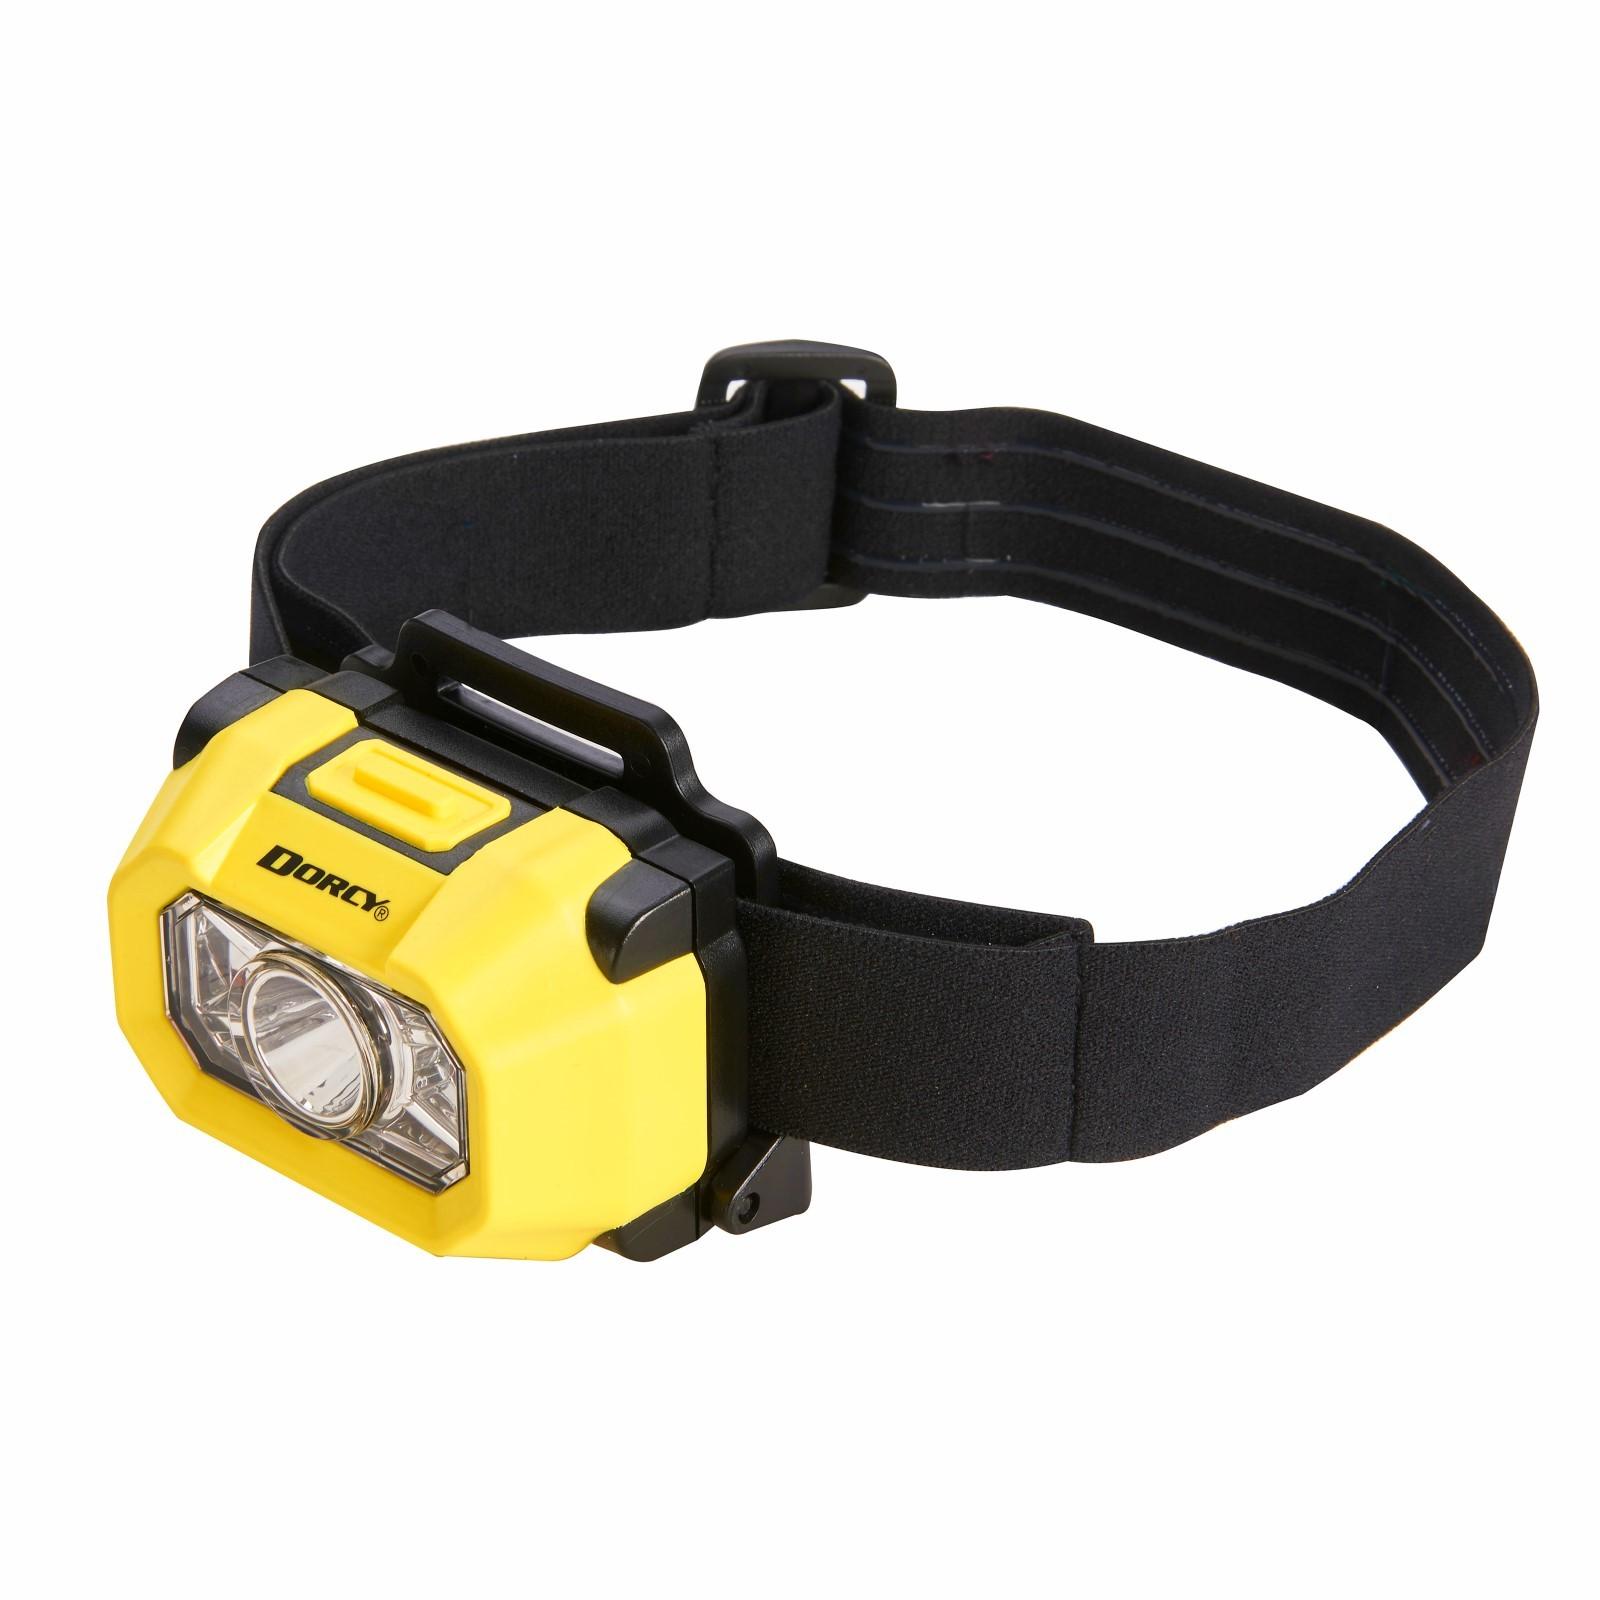 Intrinsically Safe 180 Lumen Headlight